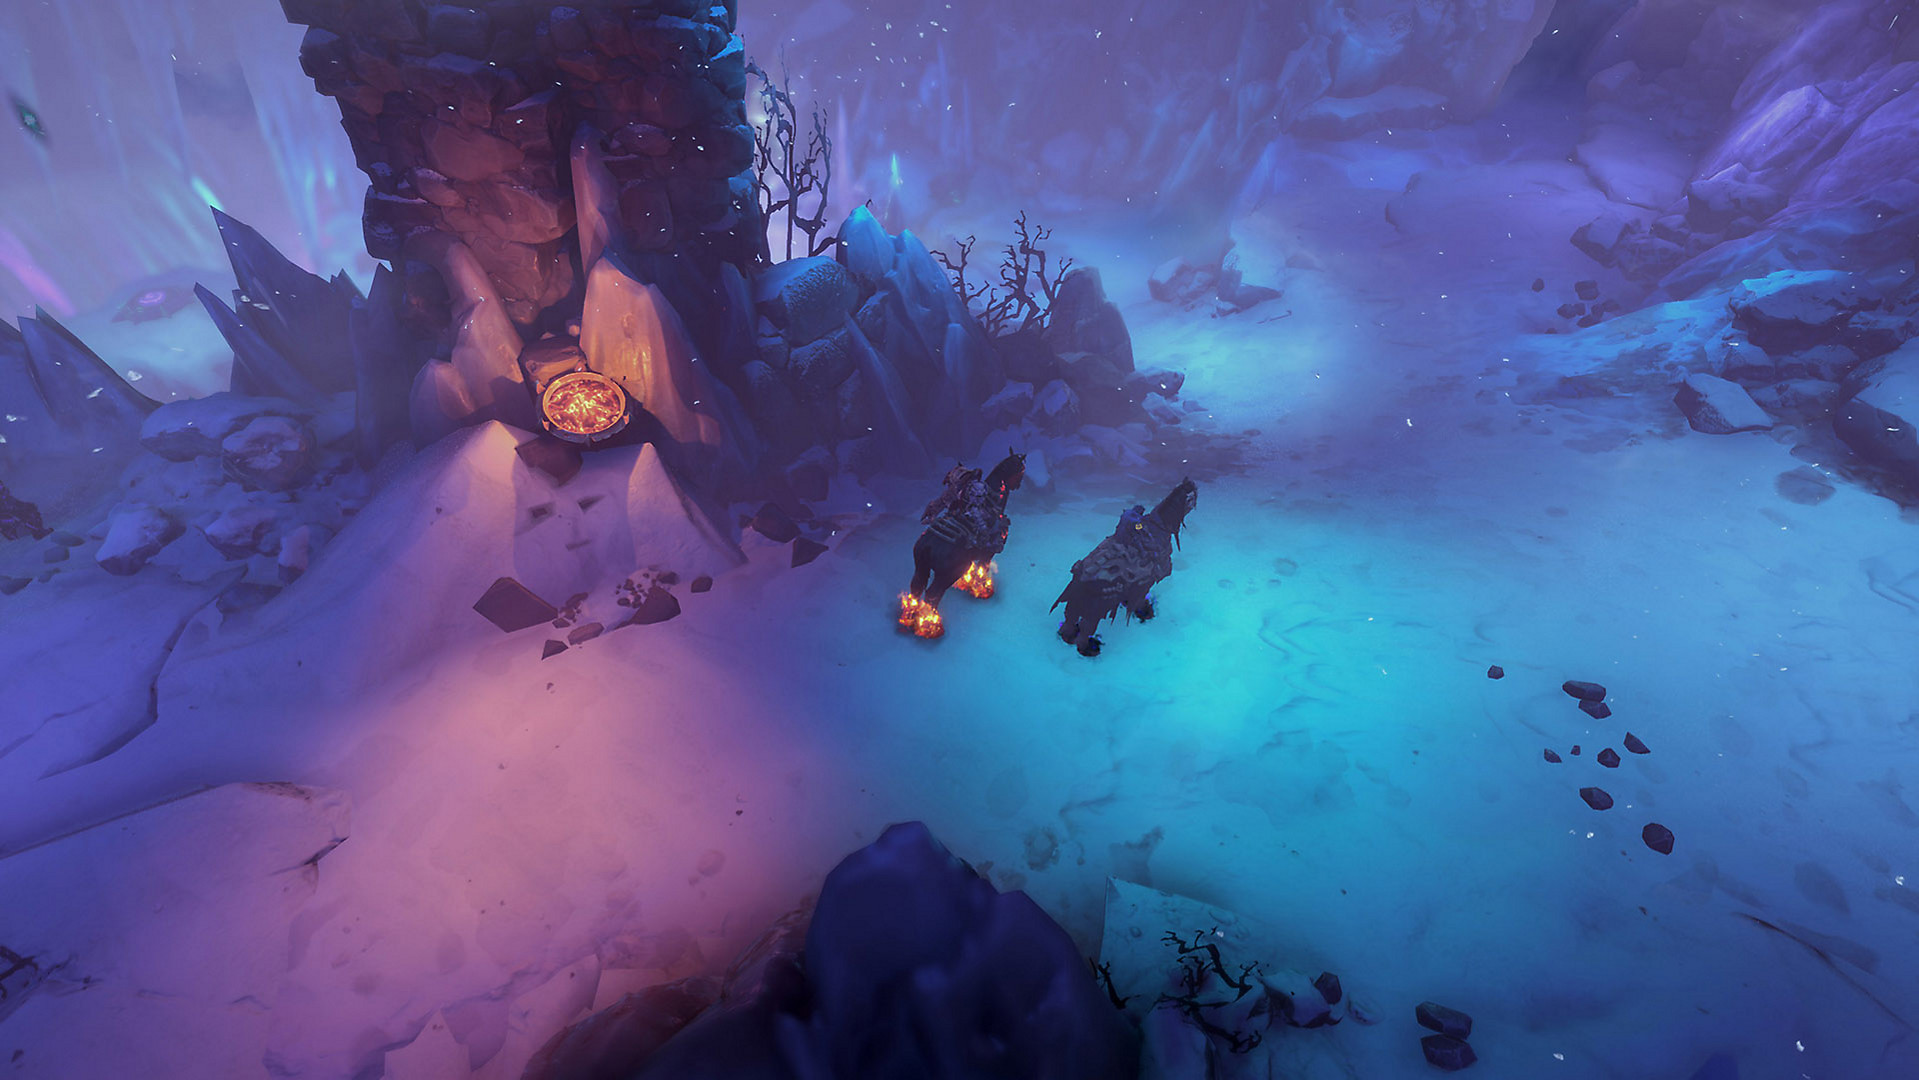 darksiders-genesis-screenshot-01-ps4-14f